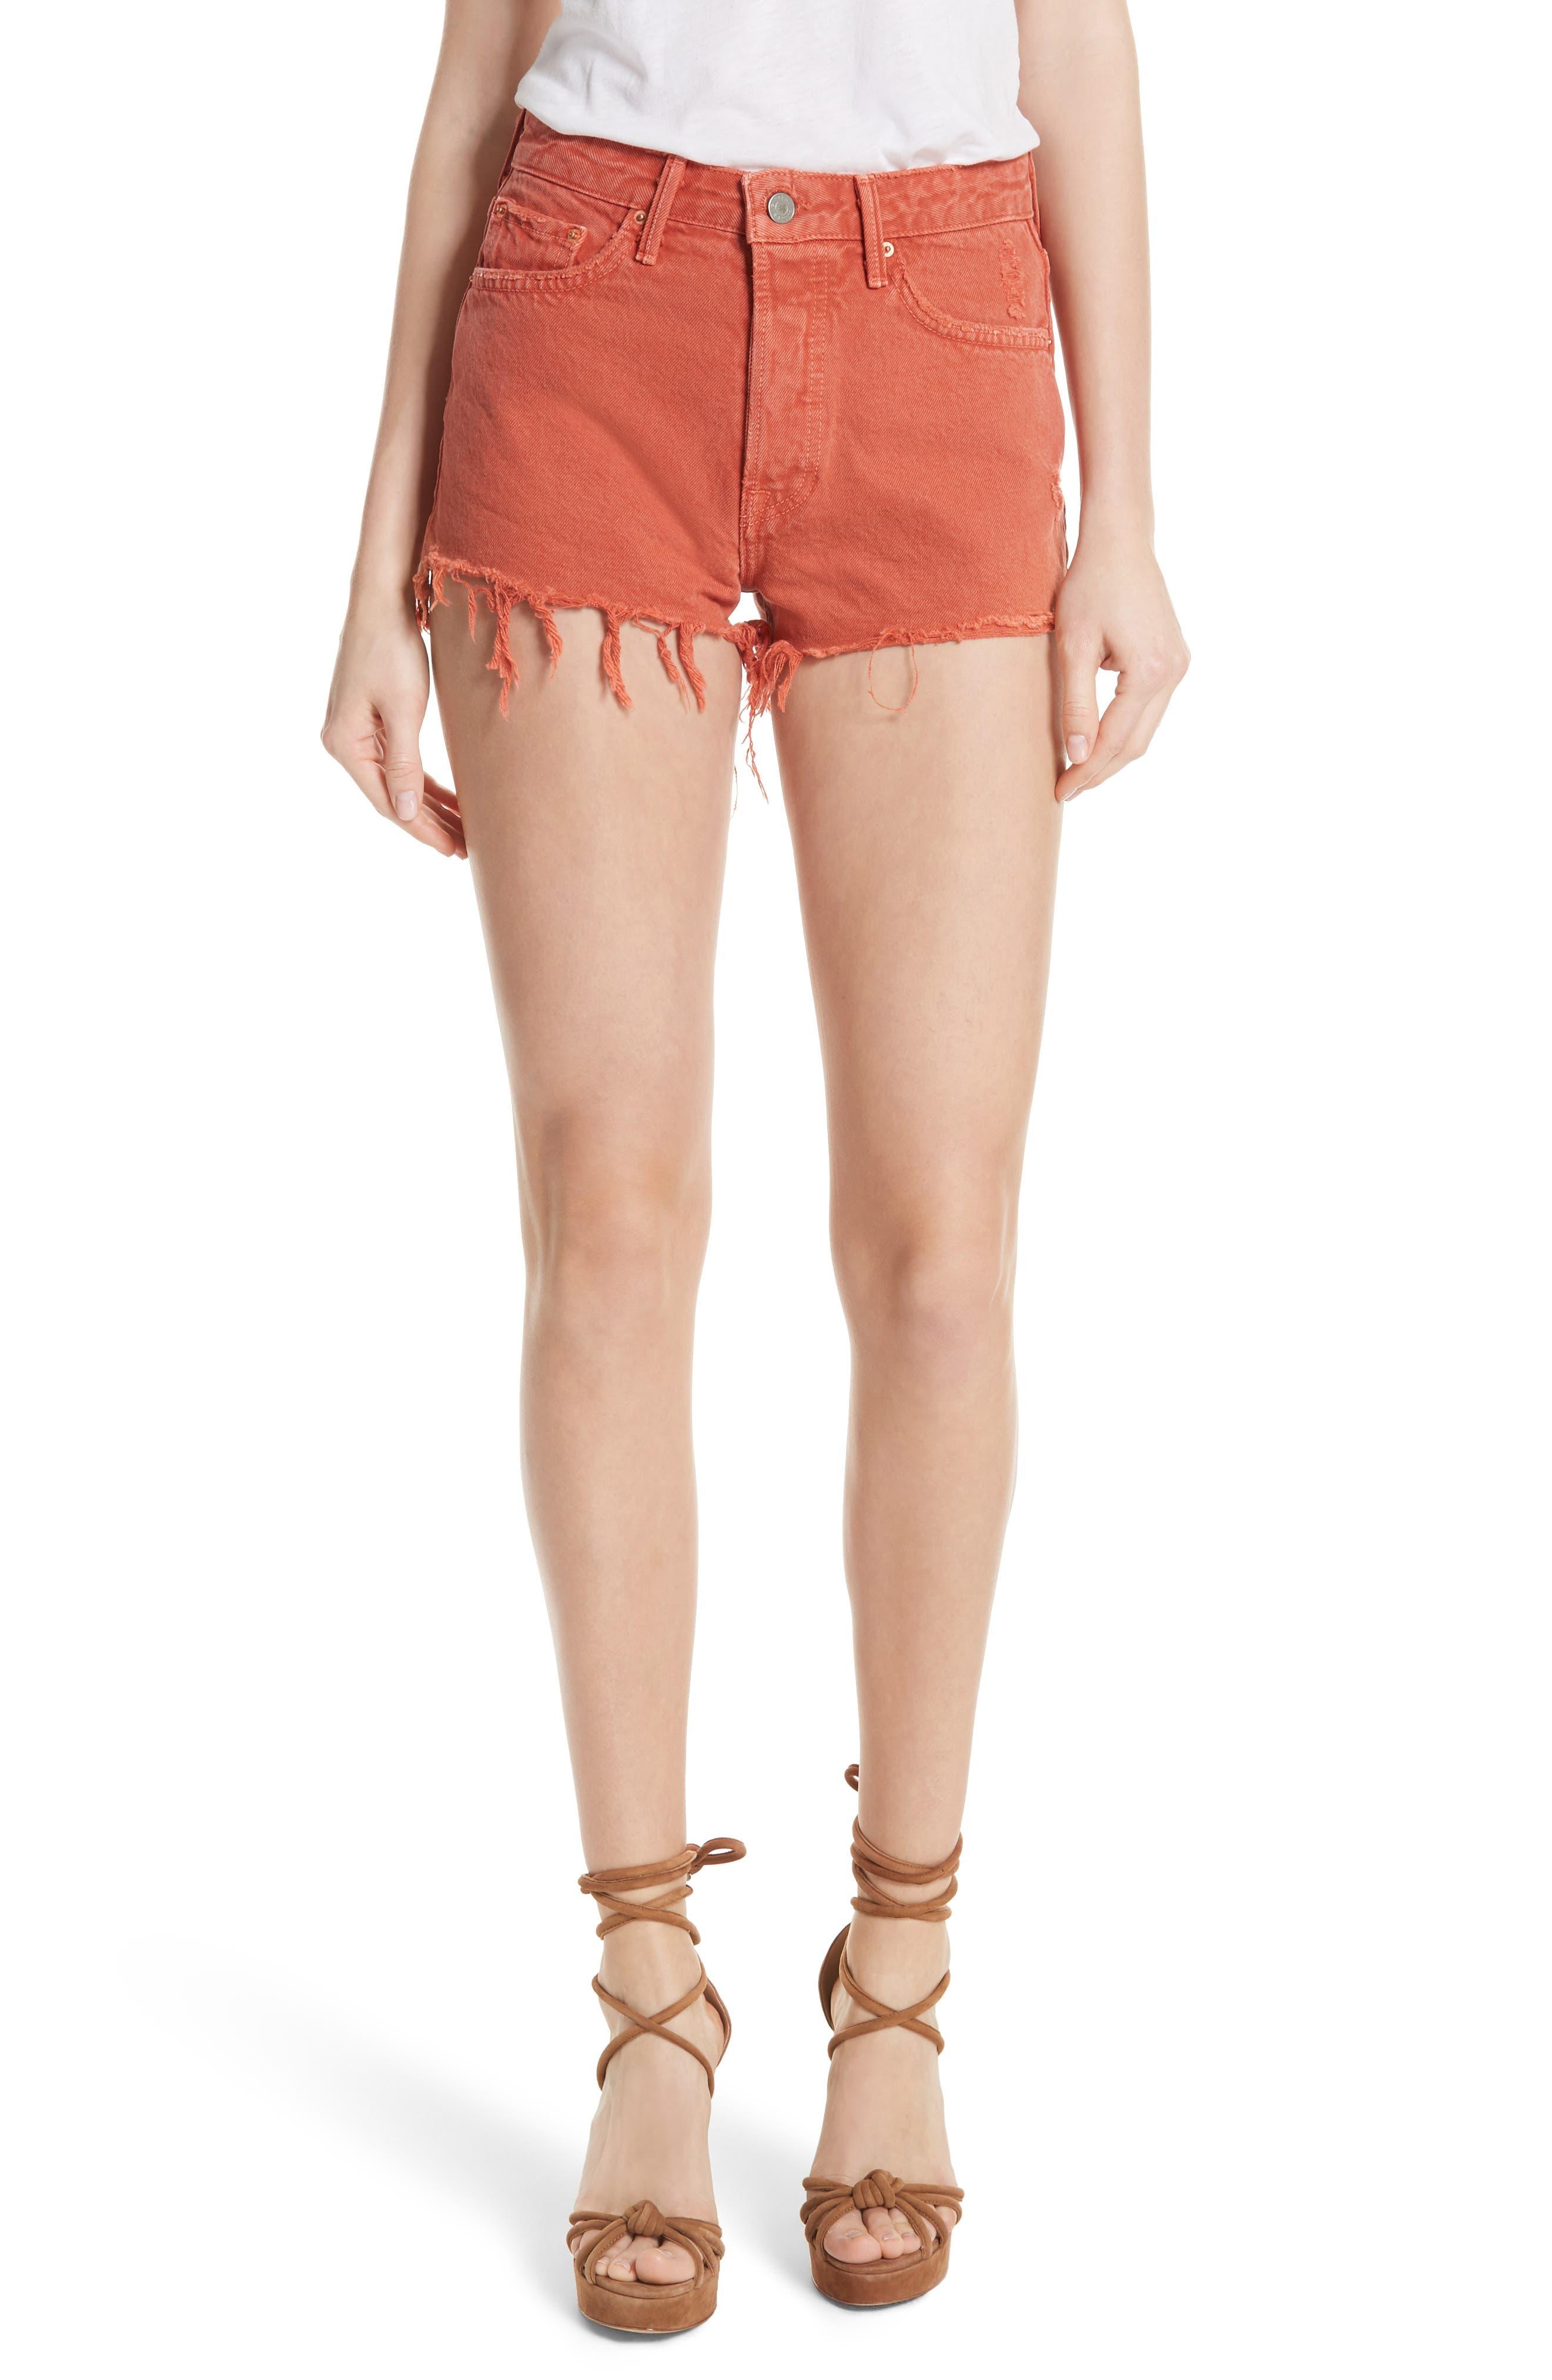 Cindy Rigid High Waist Denim Shorts,                         Main,                         color, SPICE MARKET